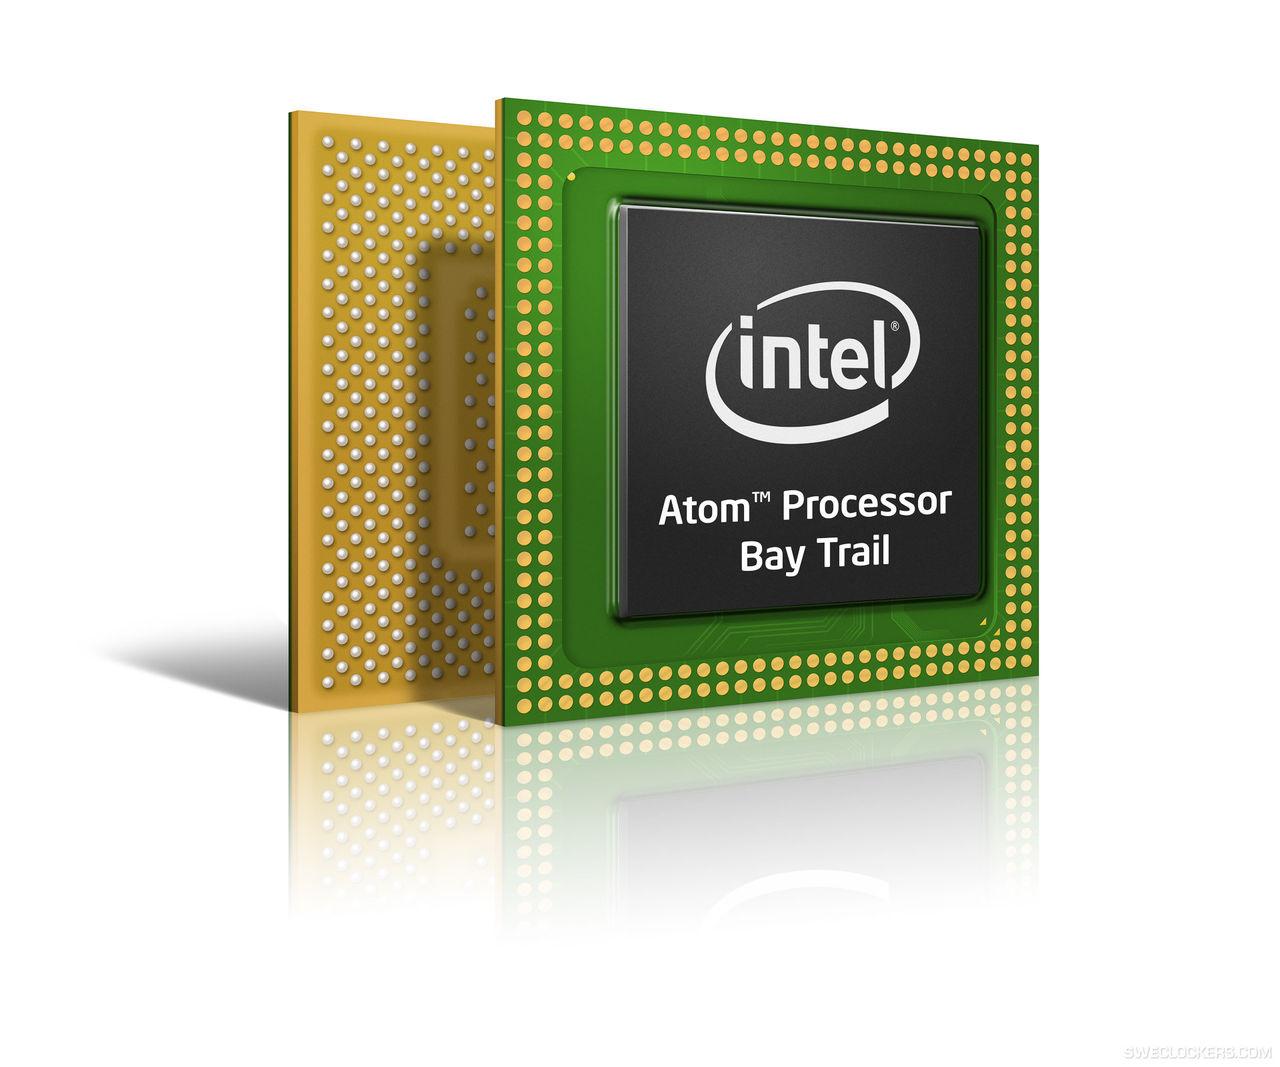 Intel släpper Bay Trail-M processorer